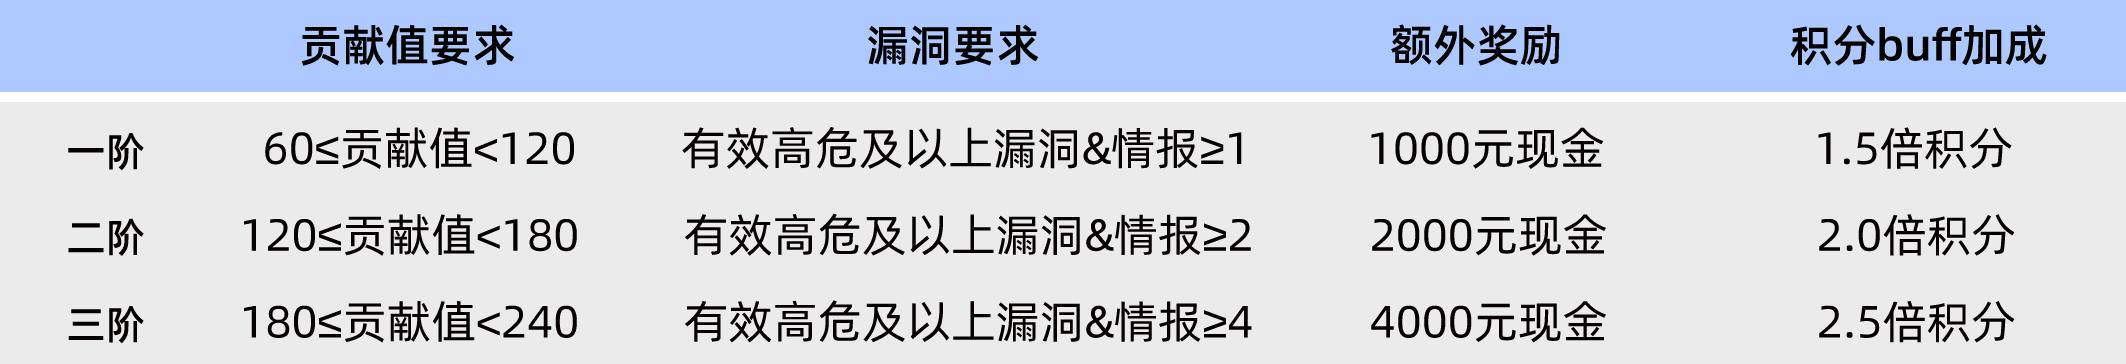 https://momo-mmsrc.oss-cn-hangzhou.aliyuncs.com/img-f57b5366-e45a-3e3e-bb83-0828840d3305.png